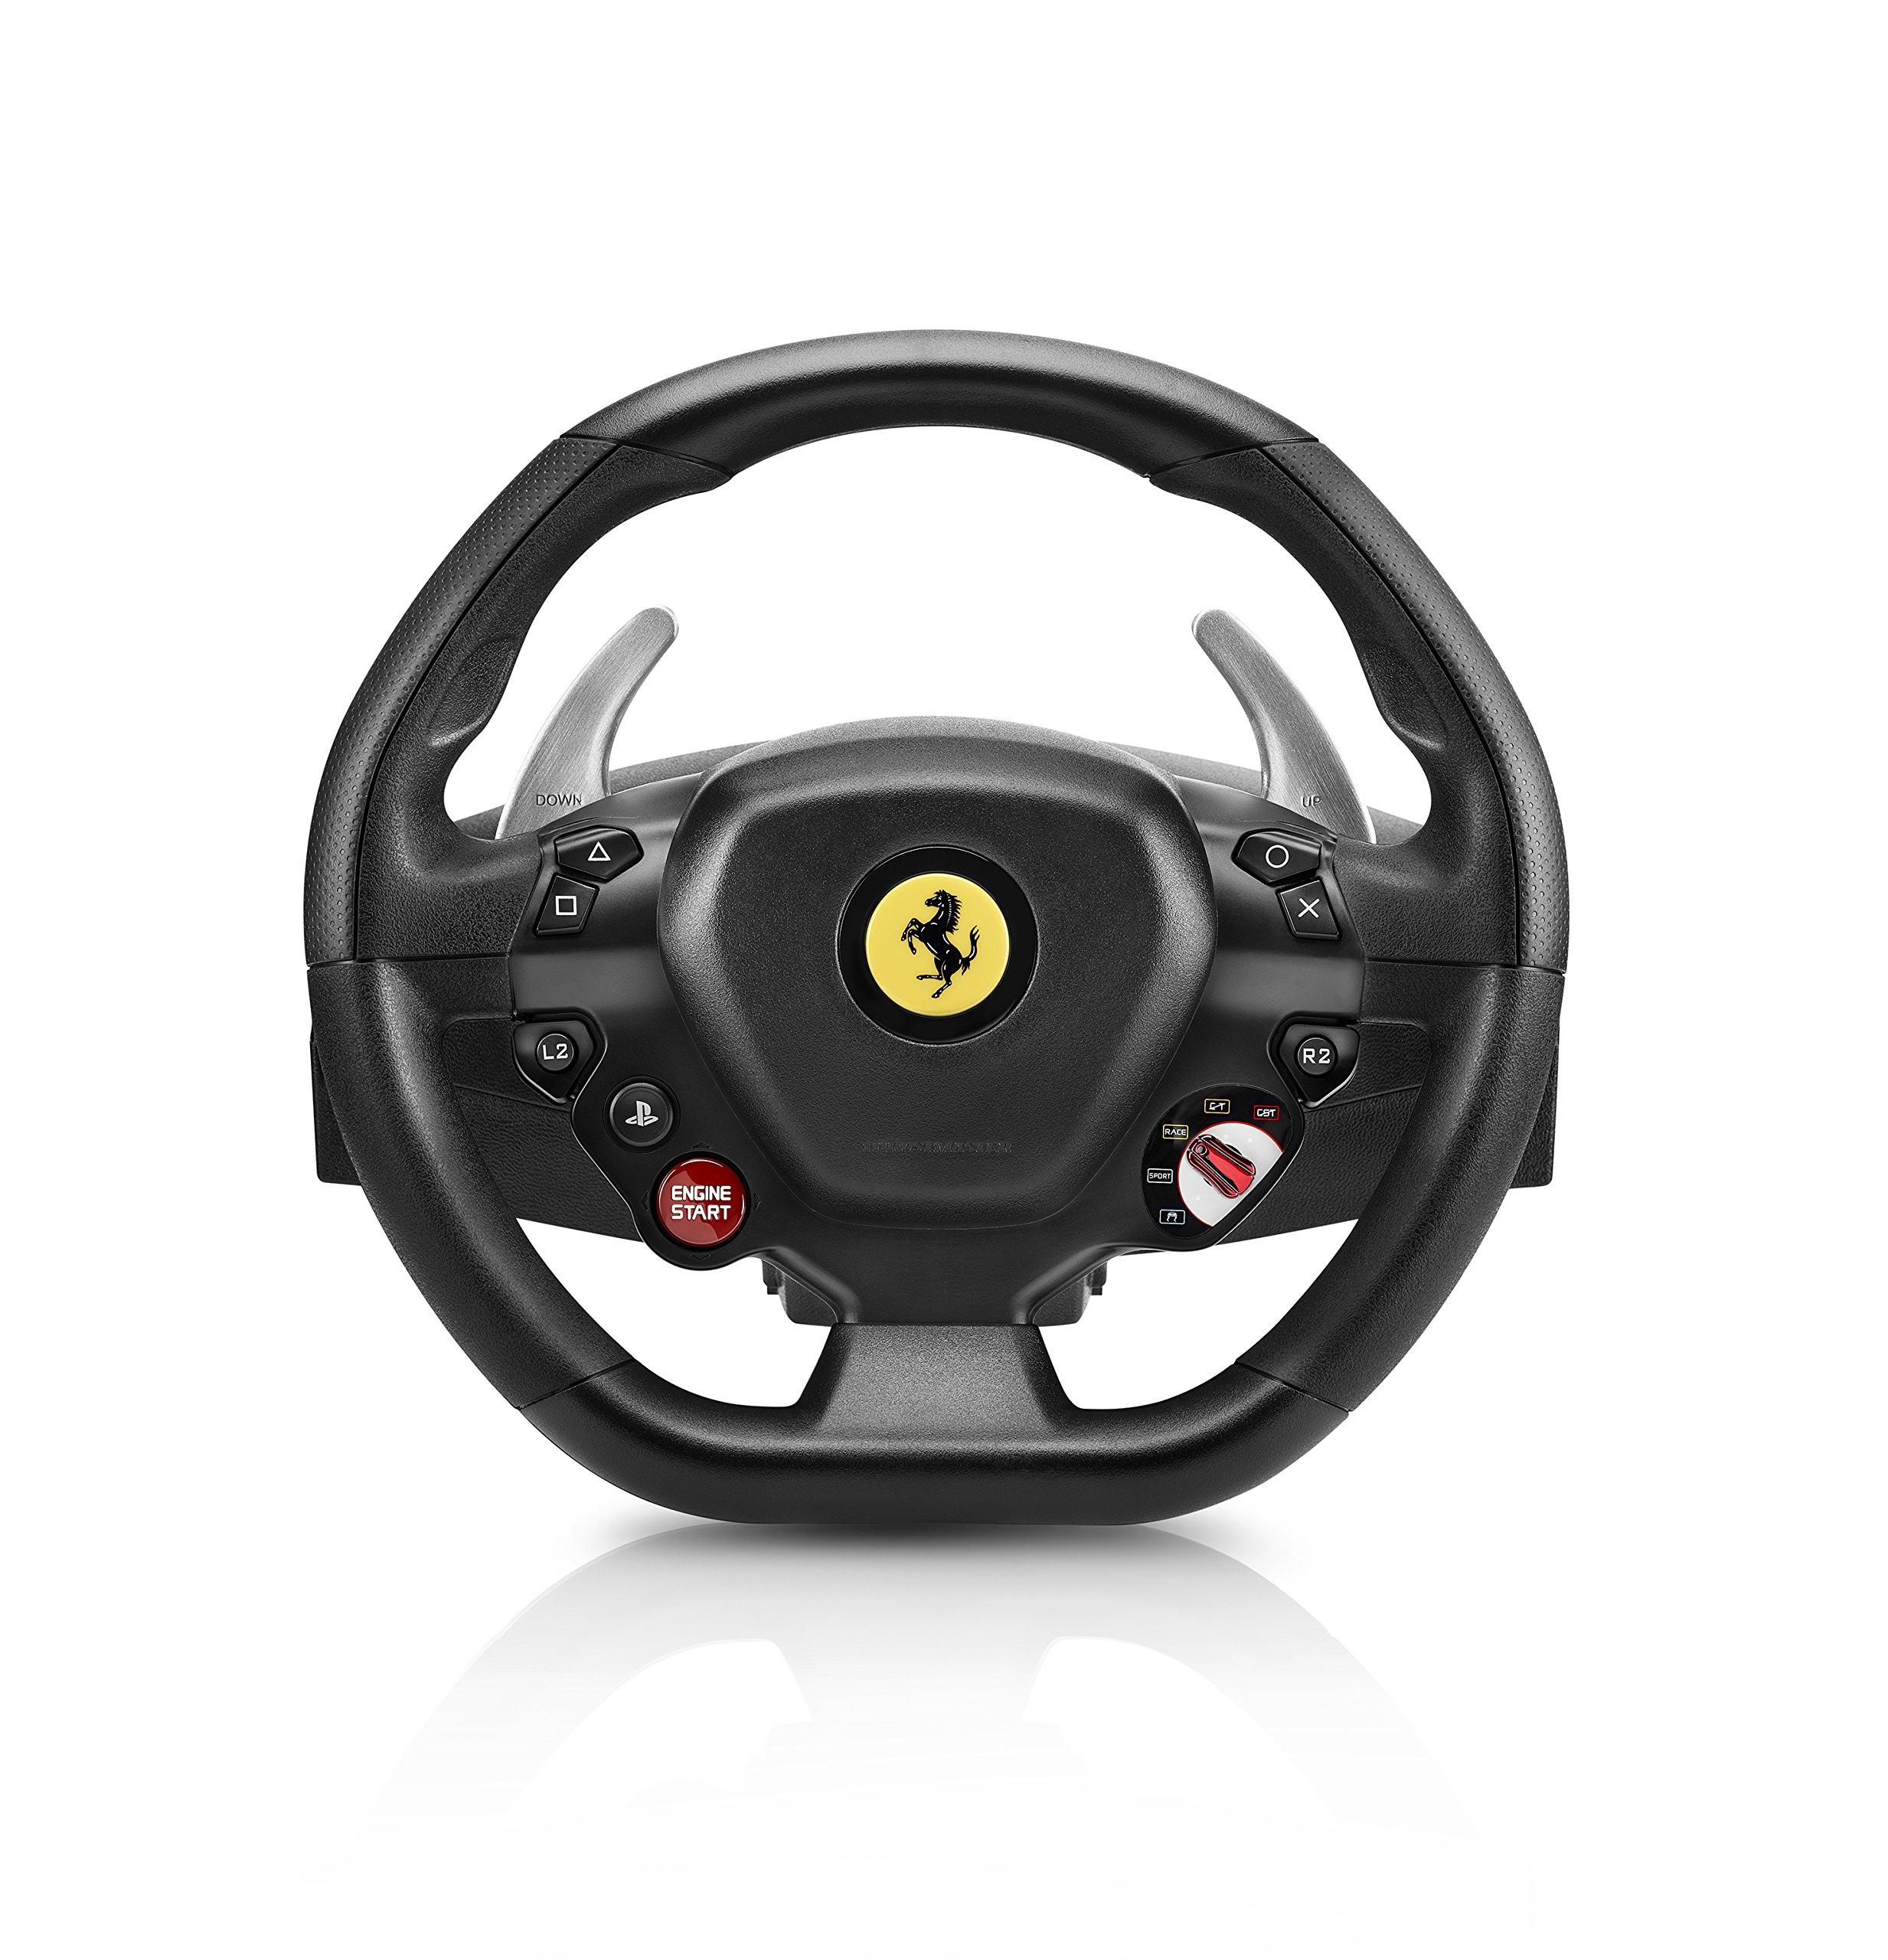 Thrustmaster - T80 RW FERRARI 488 GTB - Volante para PS4 / PC - Licencia oficial Ferrari - incluye pedales: Amazon.es: Videojuegos